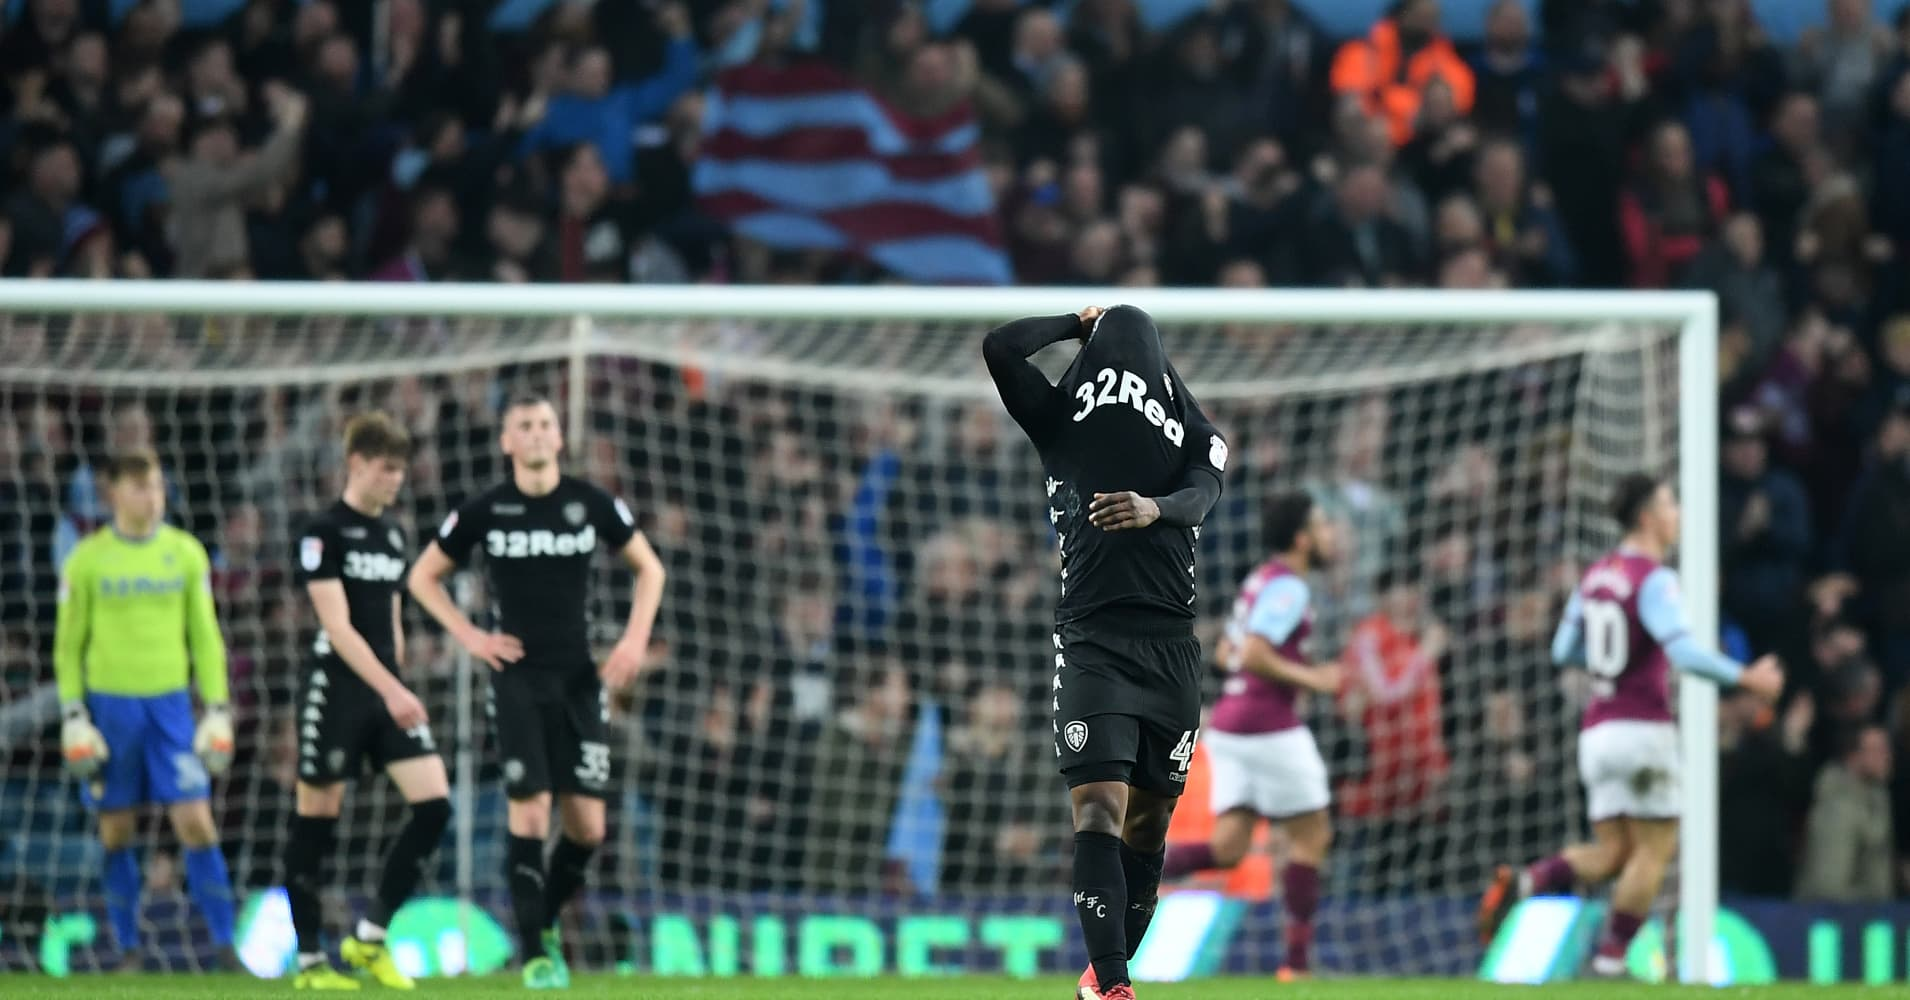 English soccer teams express anger and 'grave concern' despite $761 million TV deal